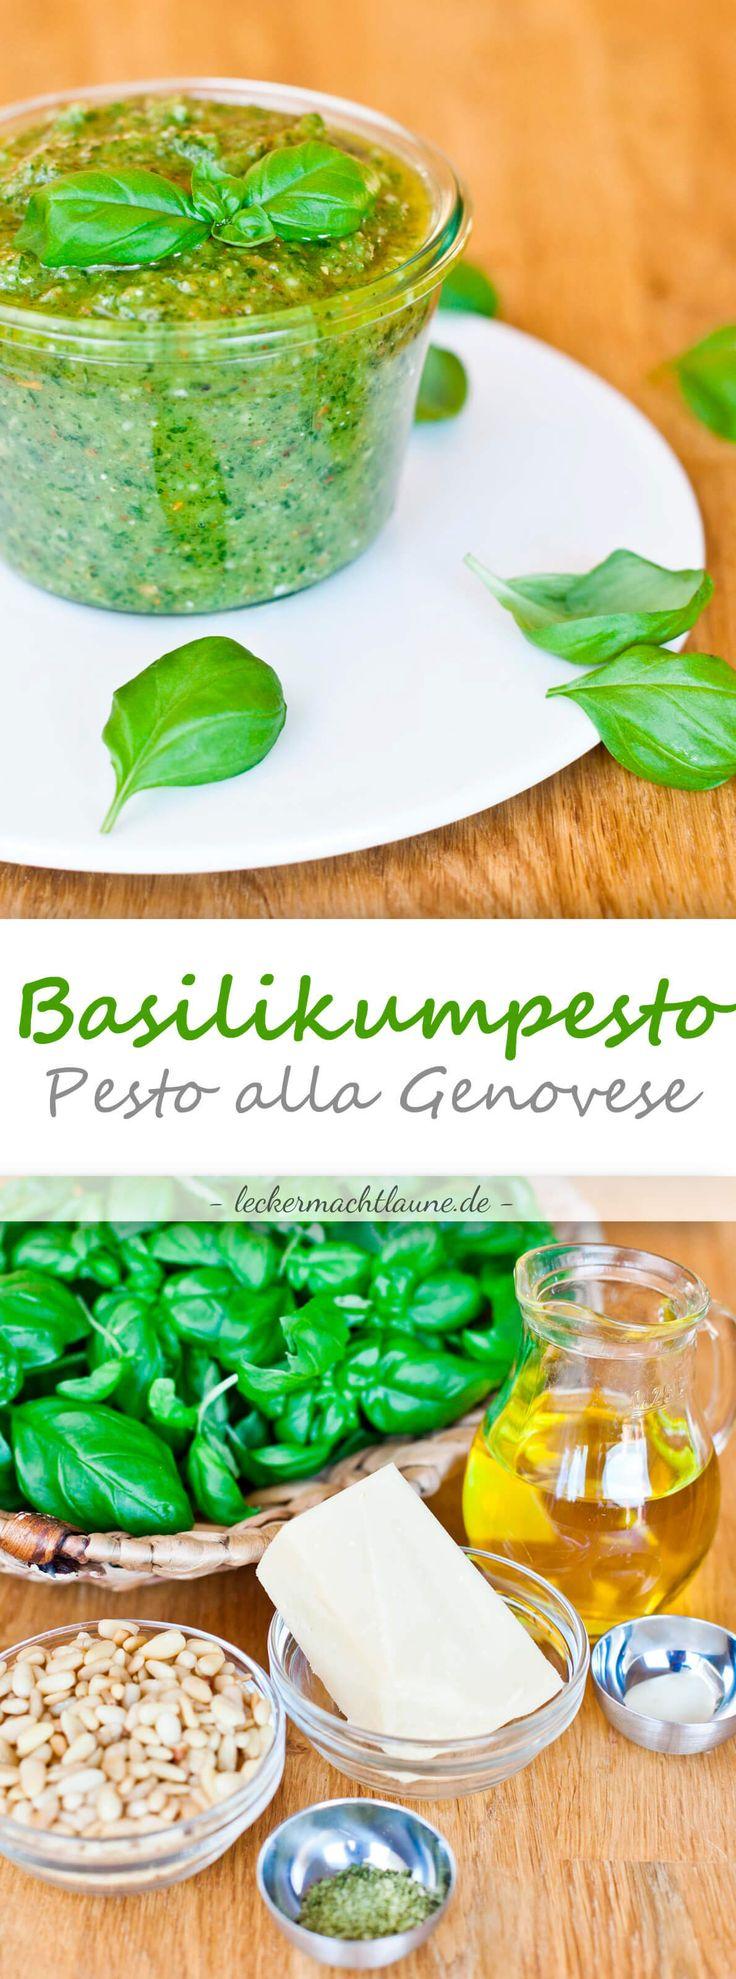 Basilikum-Pesto {pesto alla genovese}